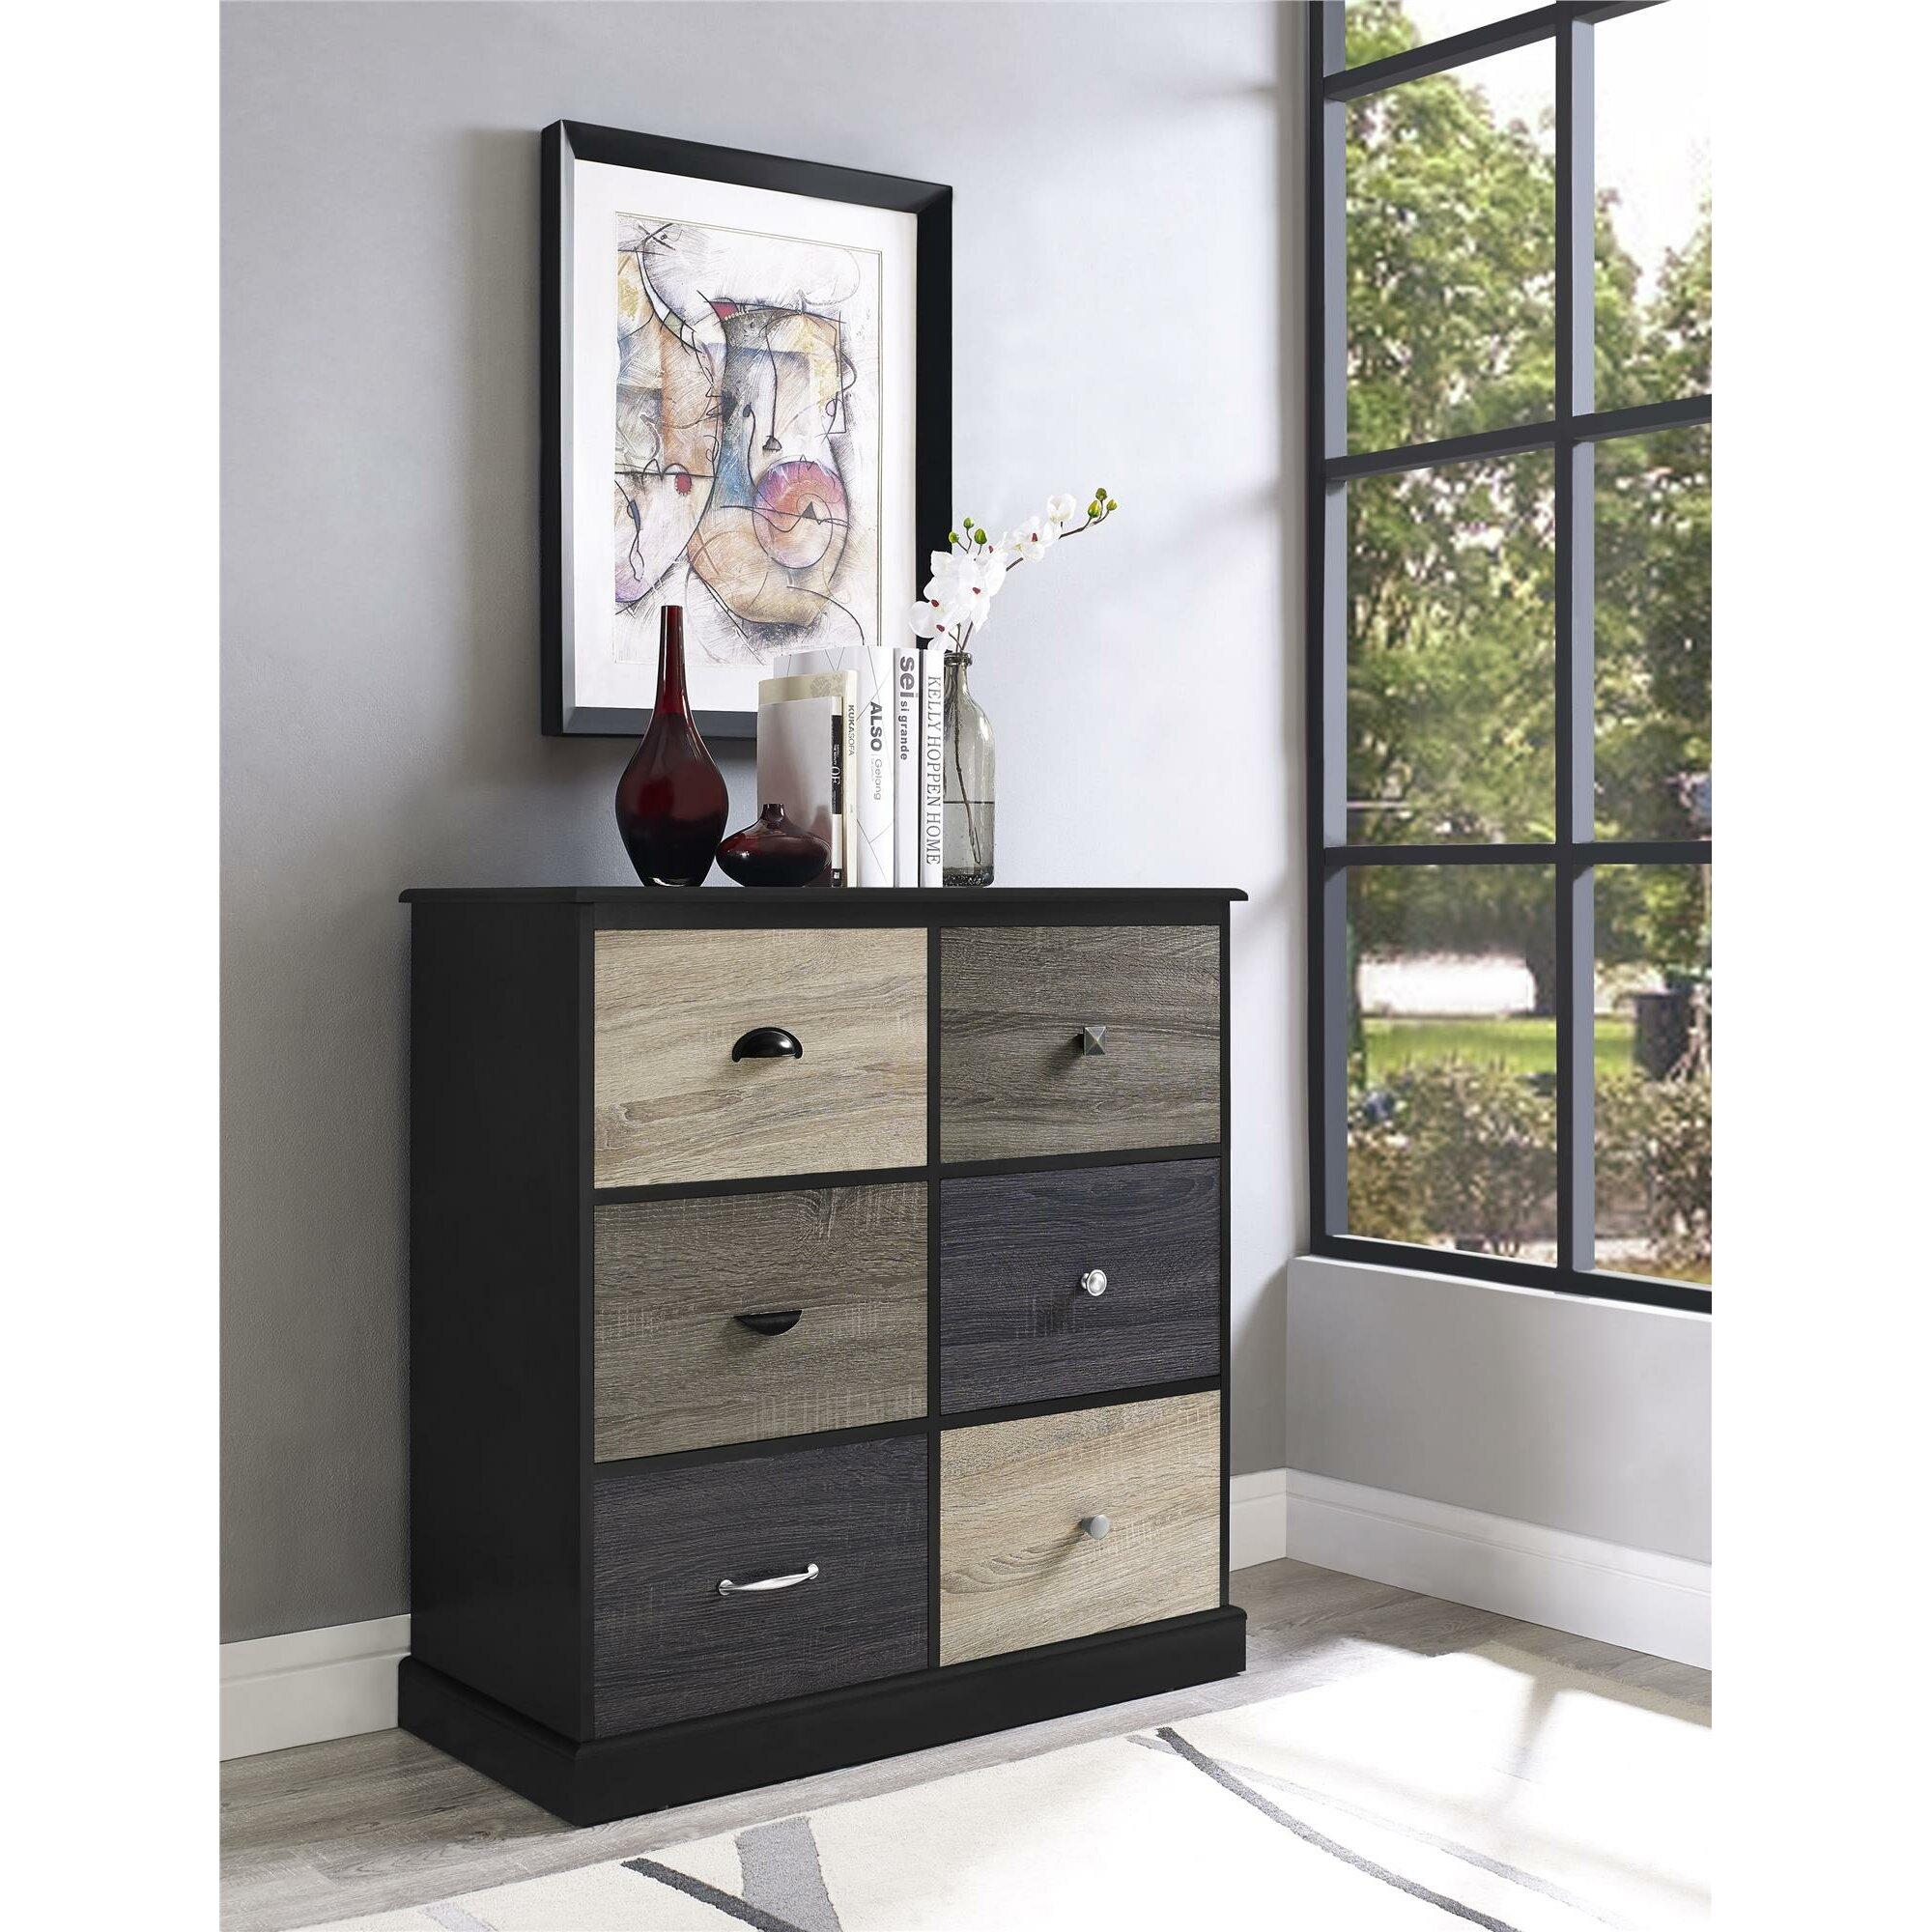 altra blackburn 6 cube storage unit reviews wayfair. Black Bedroom Furniture Sets. Home Design Ideas